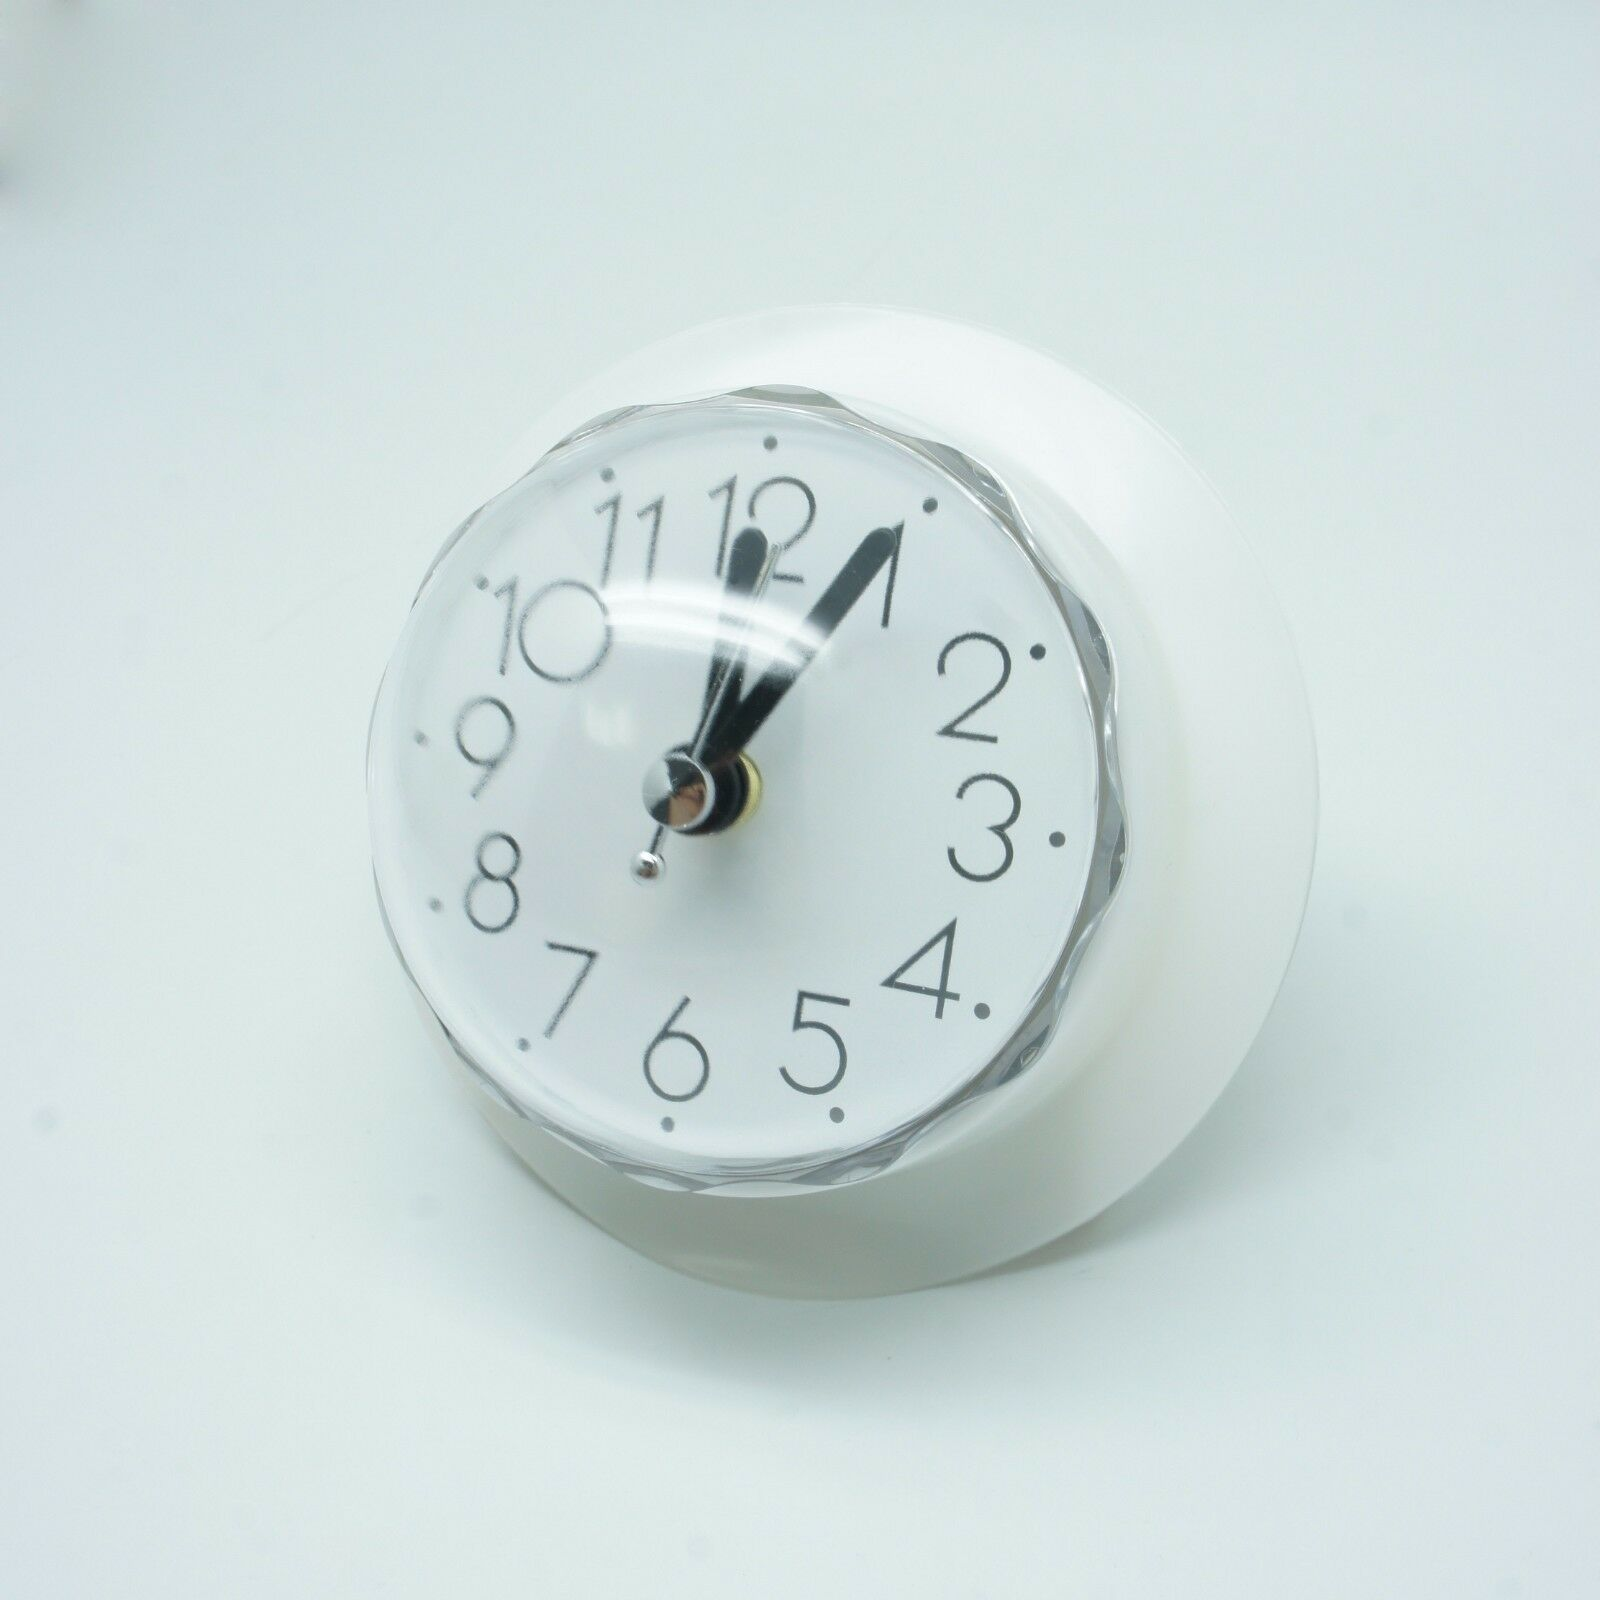 Home Garden Wall Clocks Mini Shower Clock Waterproof Ip24 Wall